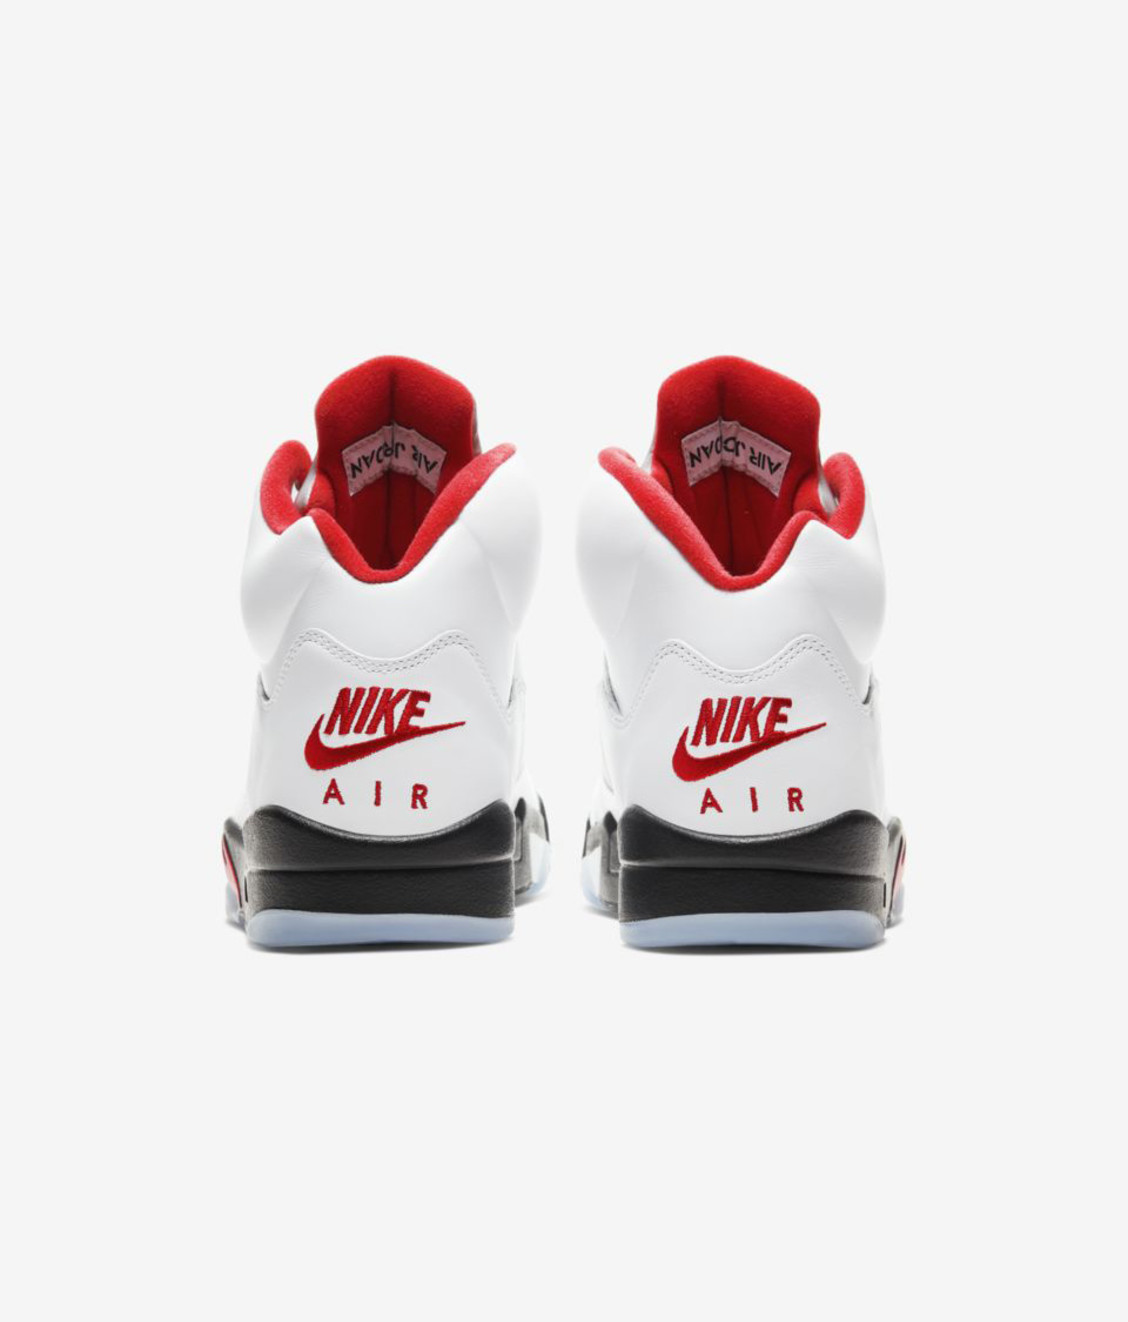 Nike Air Jordan 5 True White Fire Red